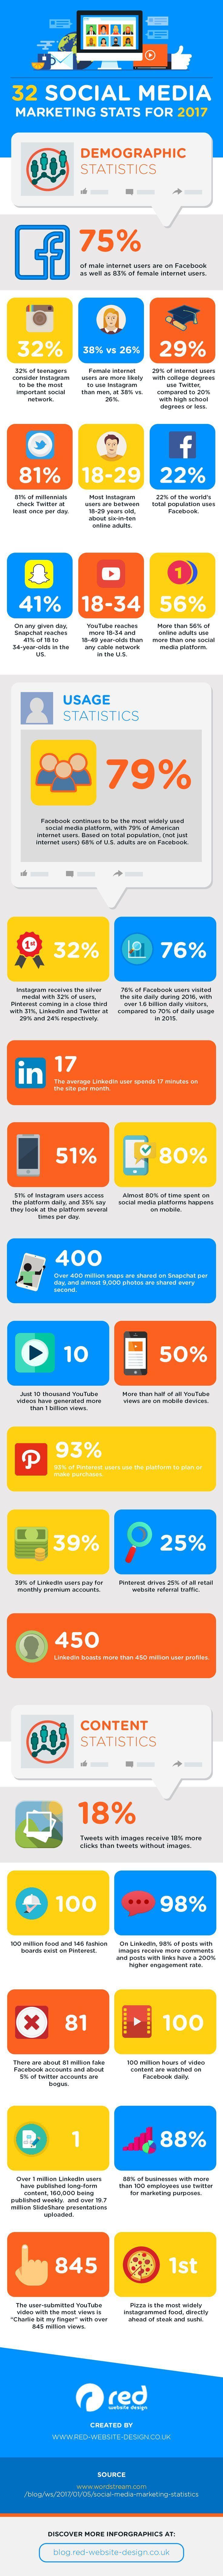 30+ Essential Social Media Marketing Statistics for 2017 - infographic